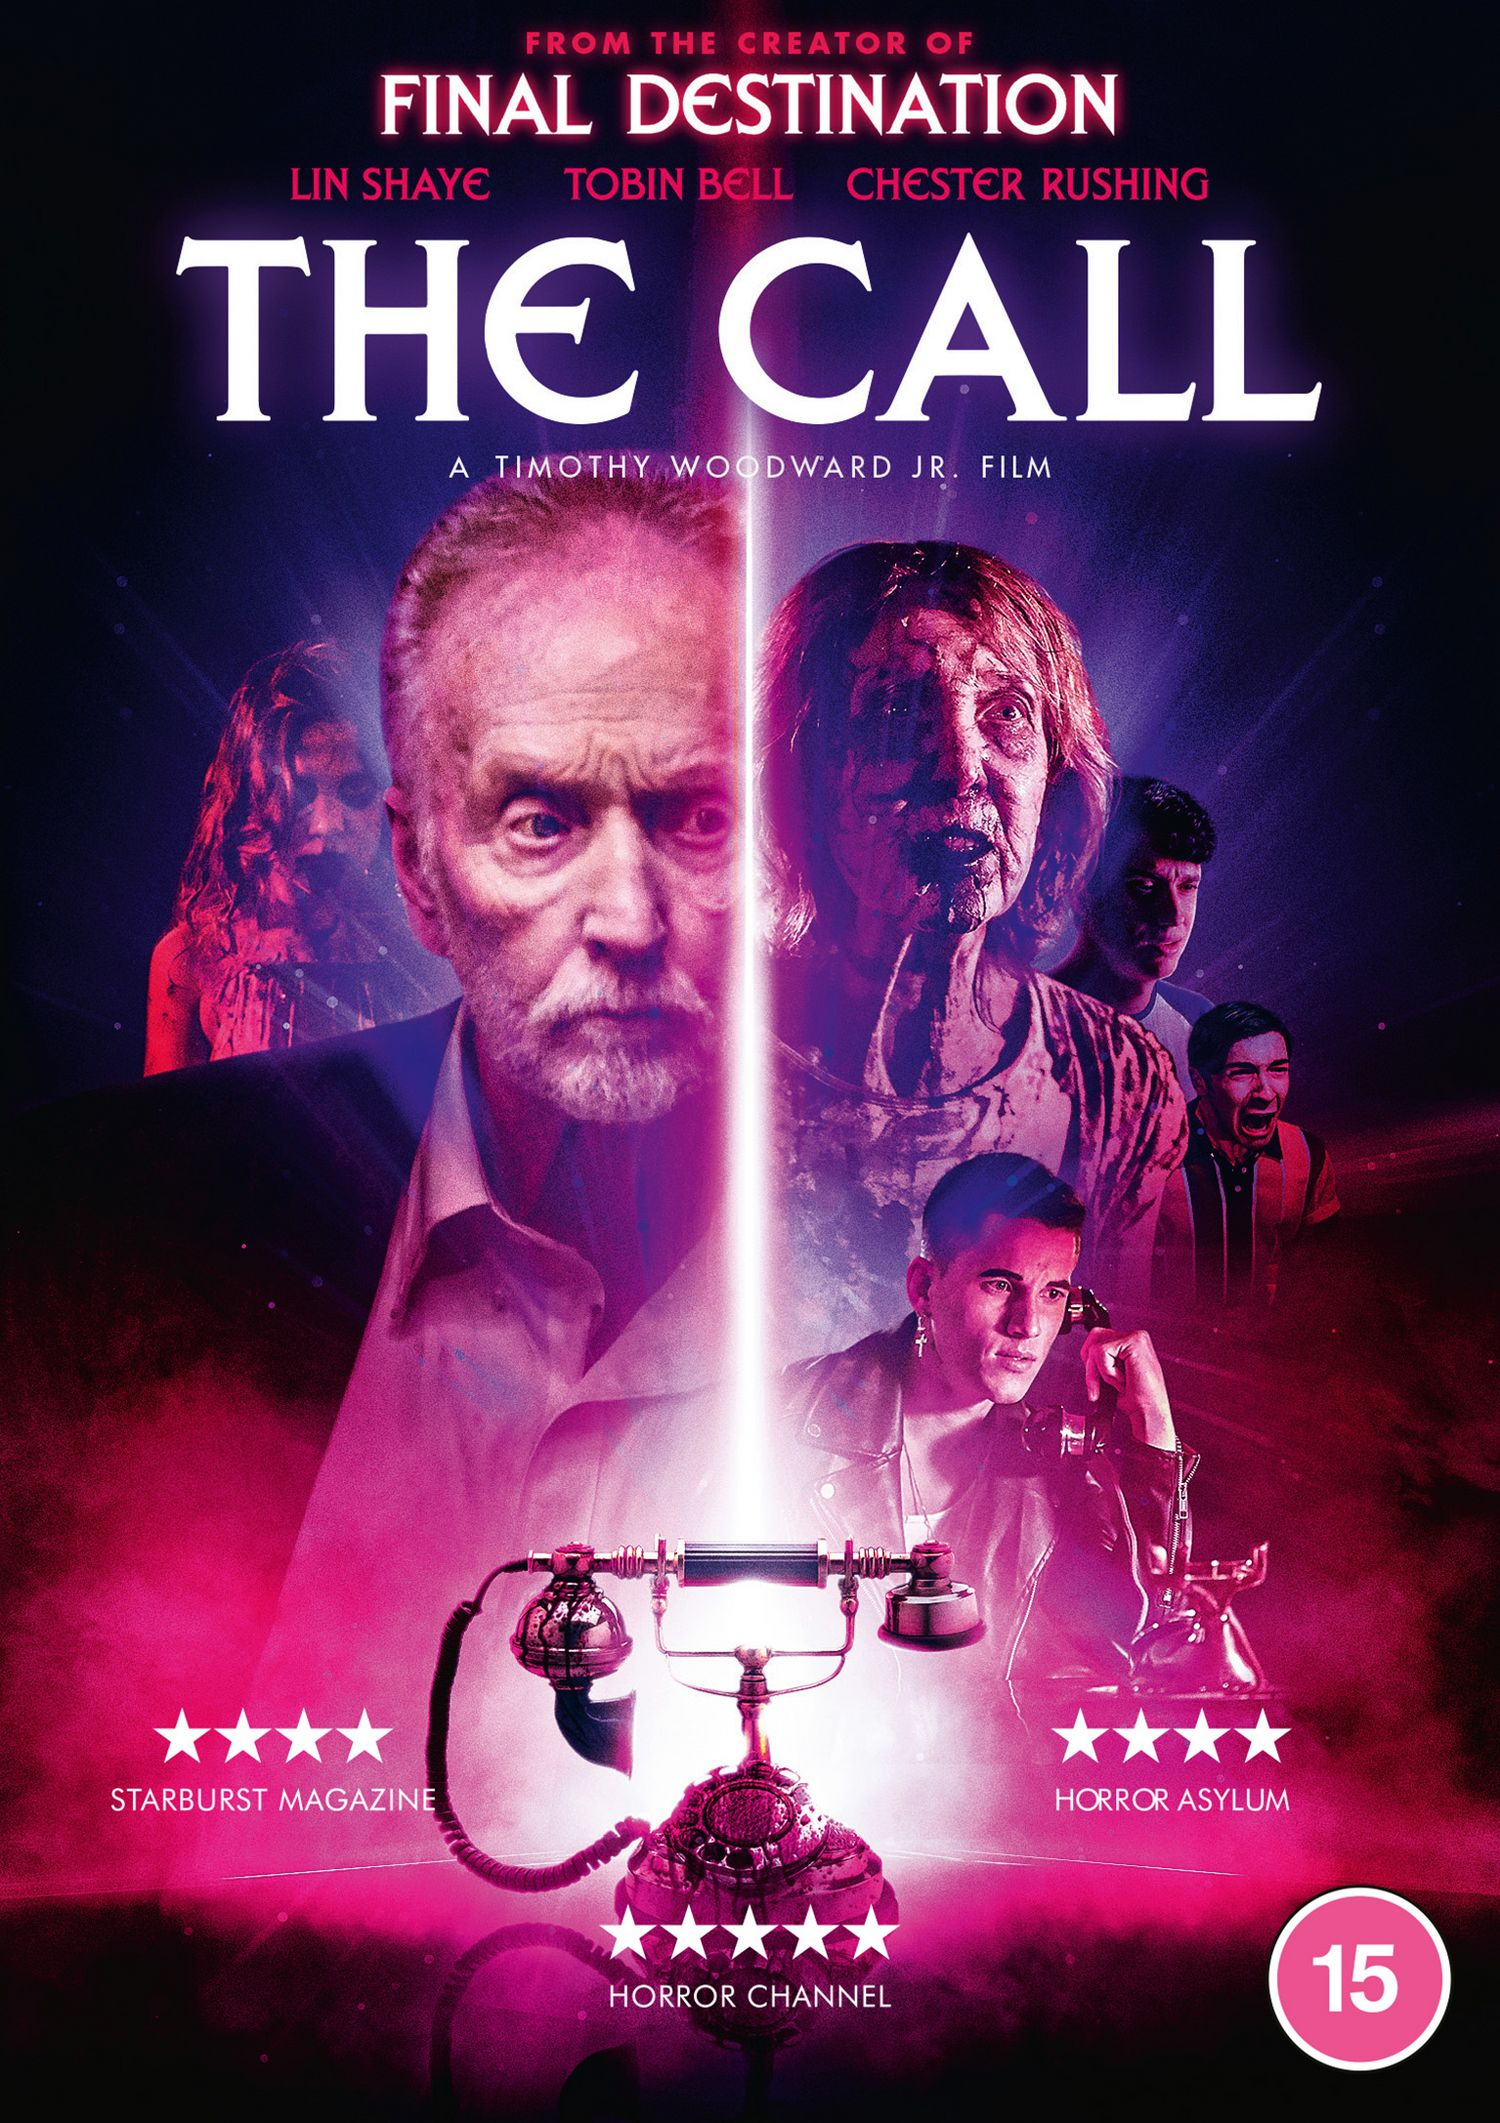 46590_2_THE_CALL_DVD_2D_PACKSHOT